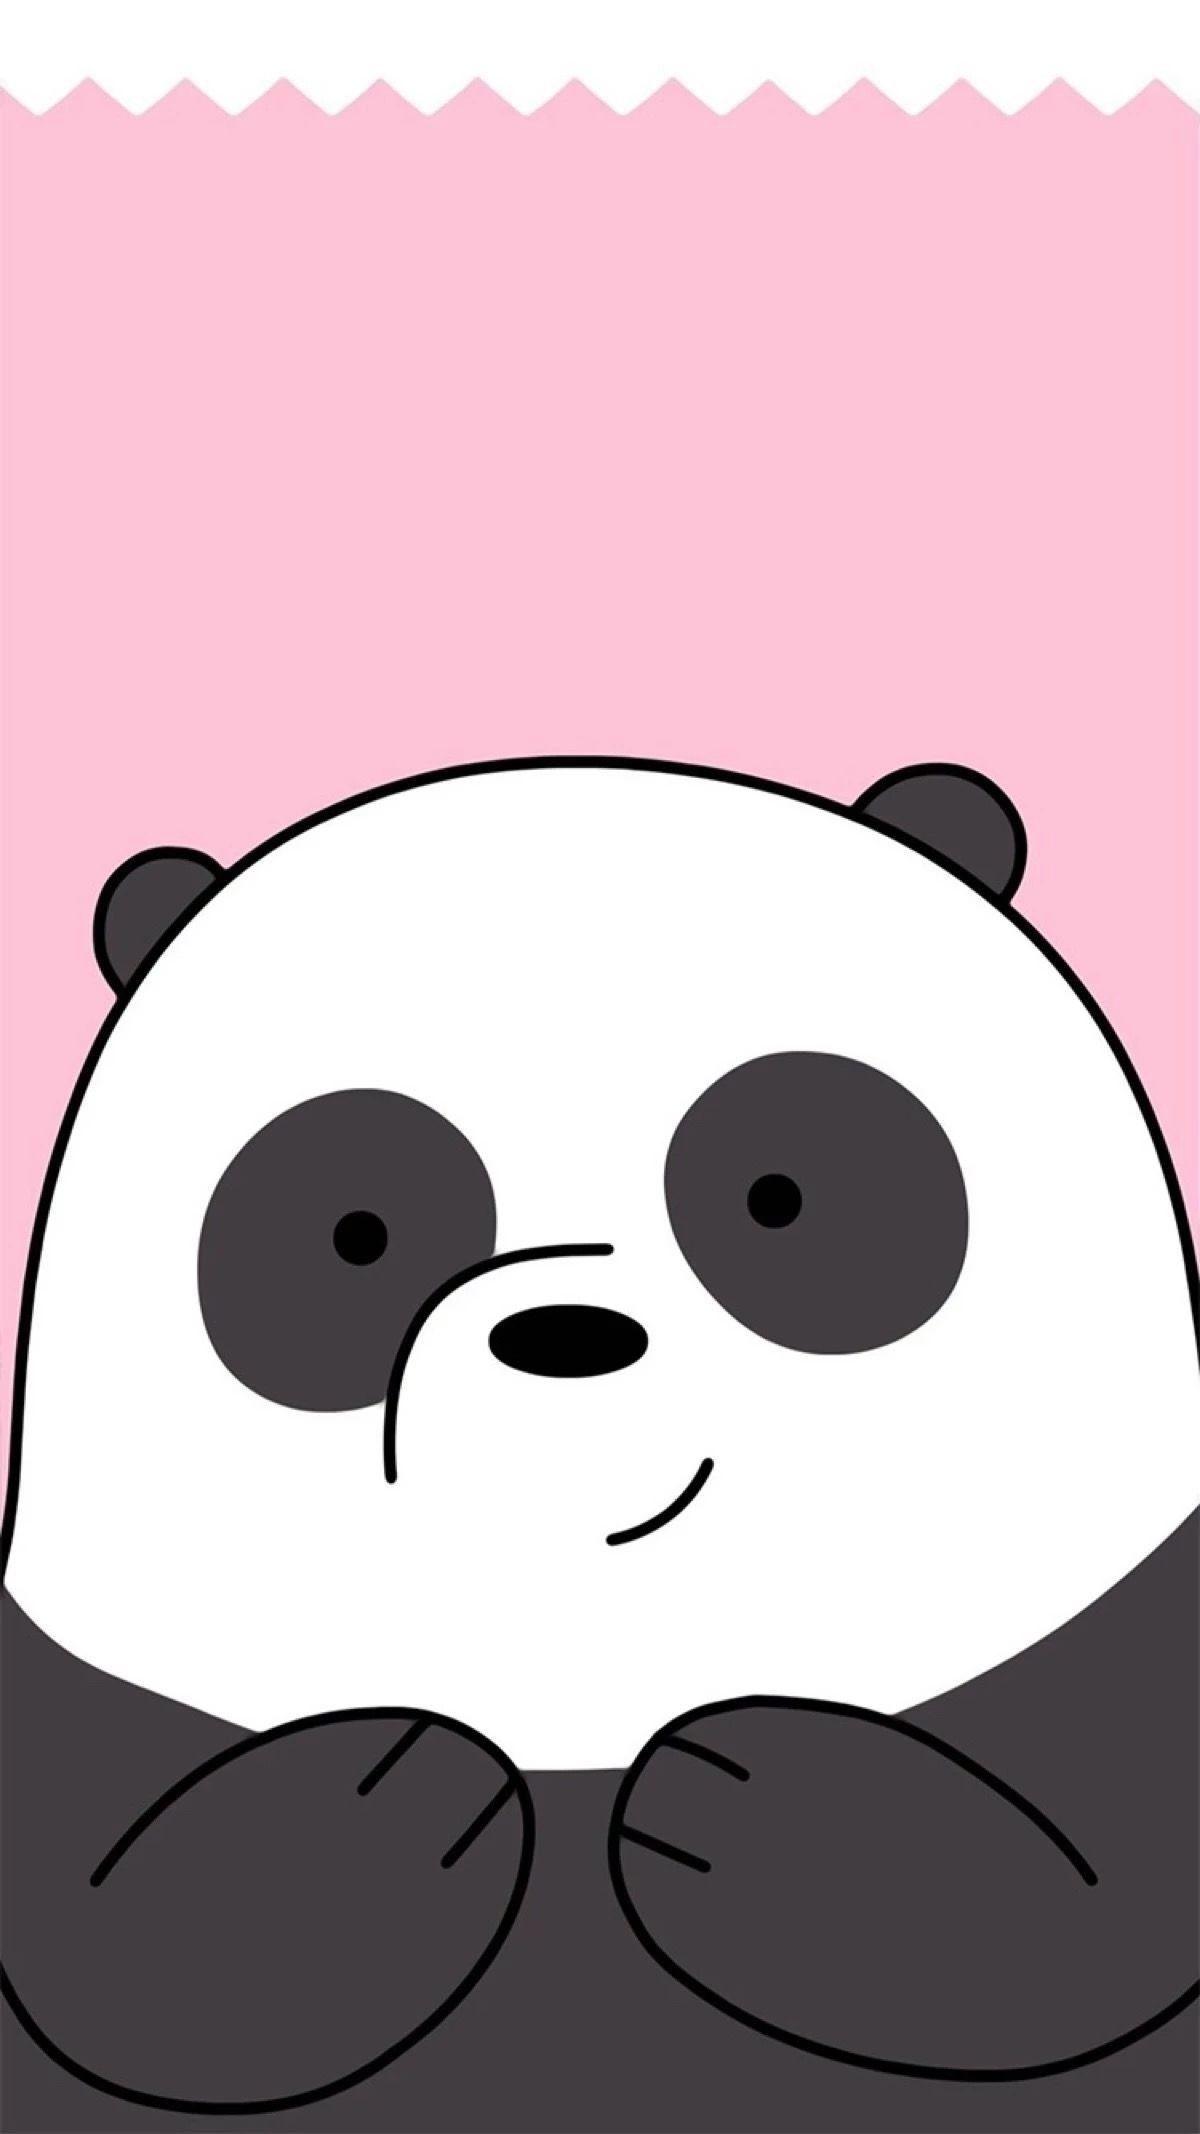 Luxury Tare Panda Iphone Wallpaper Wallpaper Iphone Wallpaper Lucu Gambar Lucu